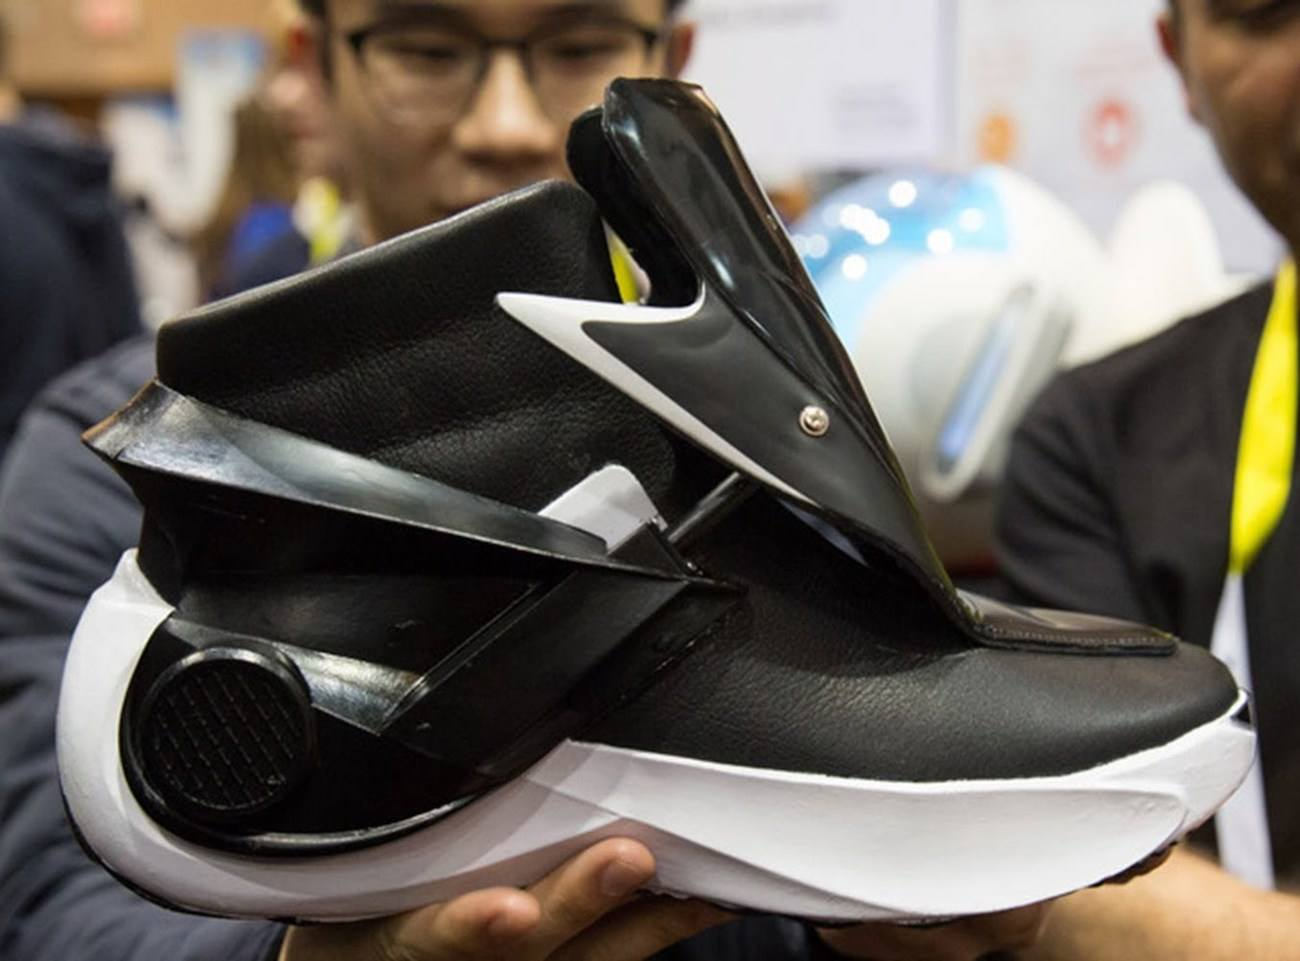 Digitsole+Smart+Shoes